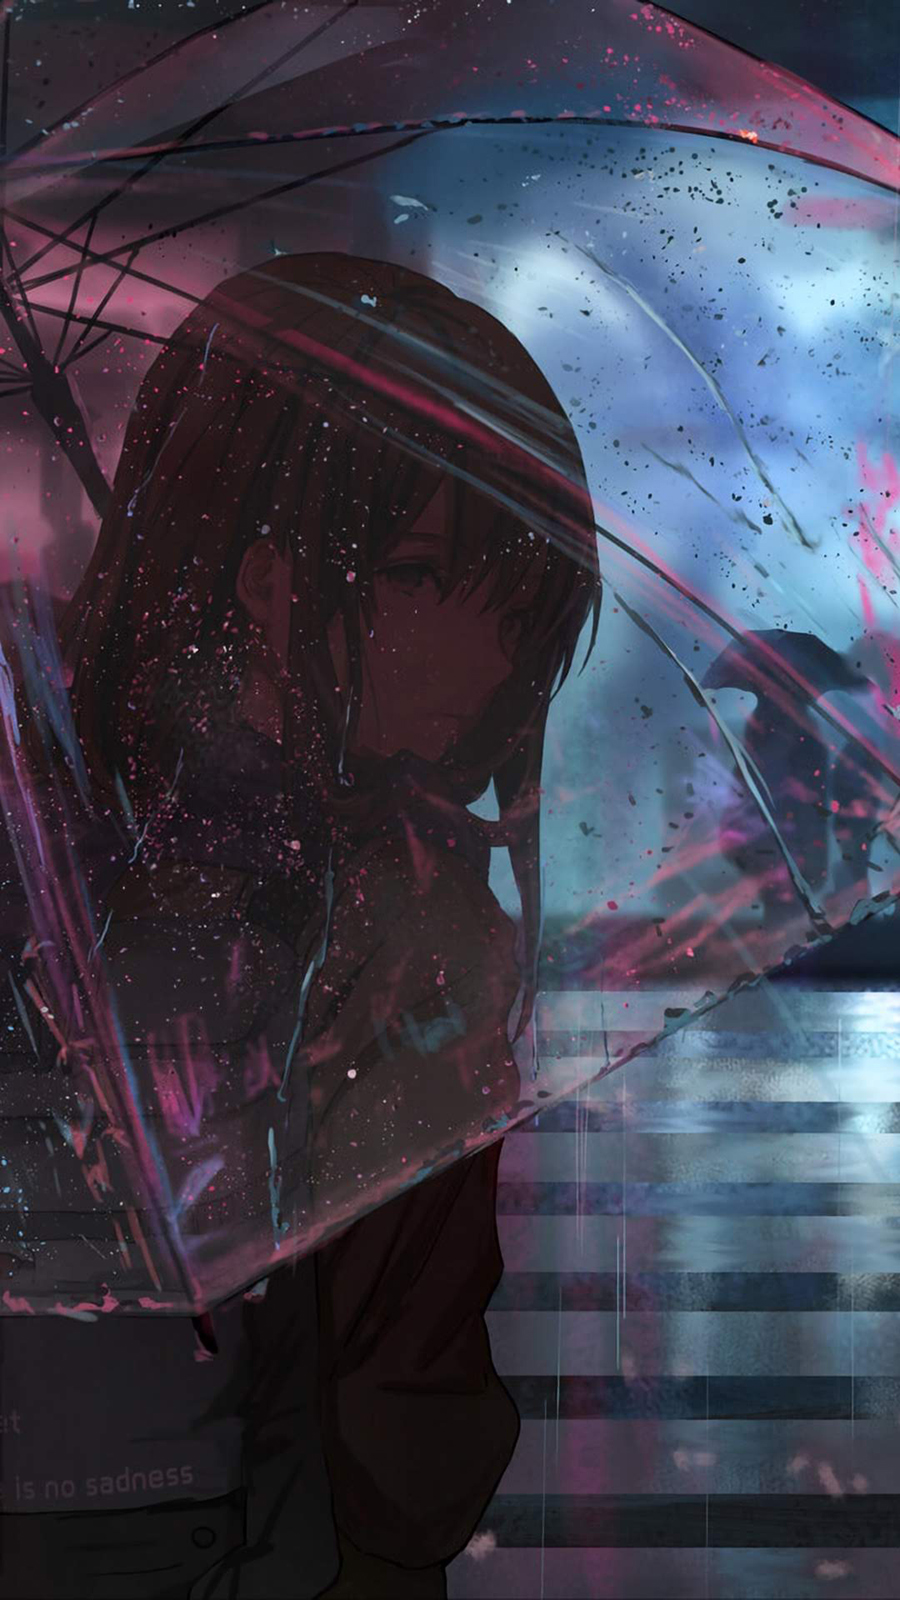 Anime Girl Wallpapers For Samsung Phones